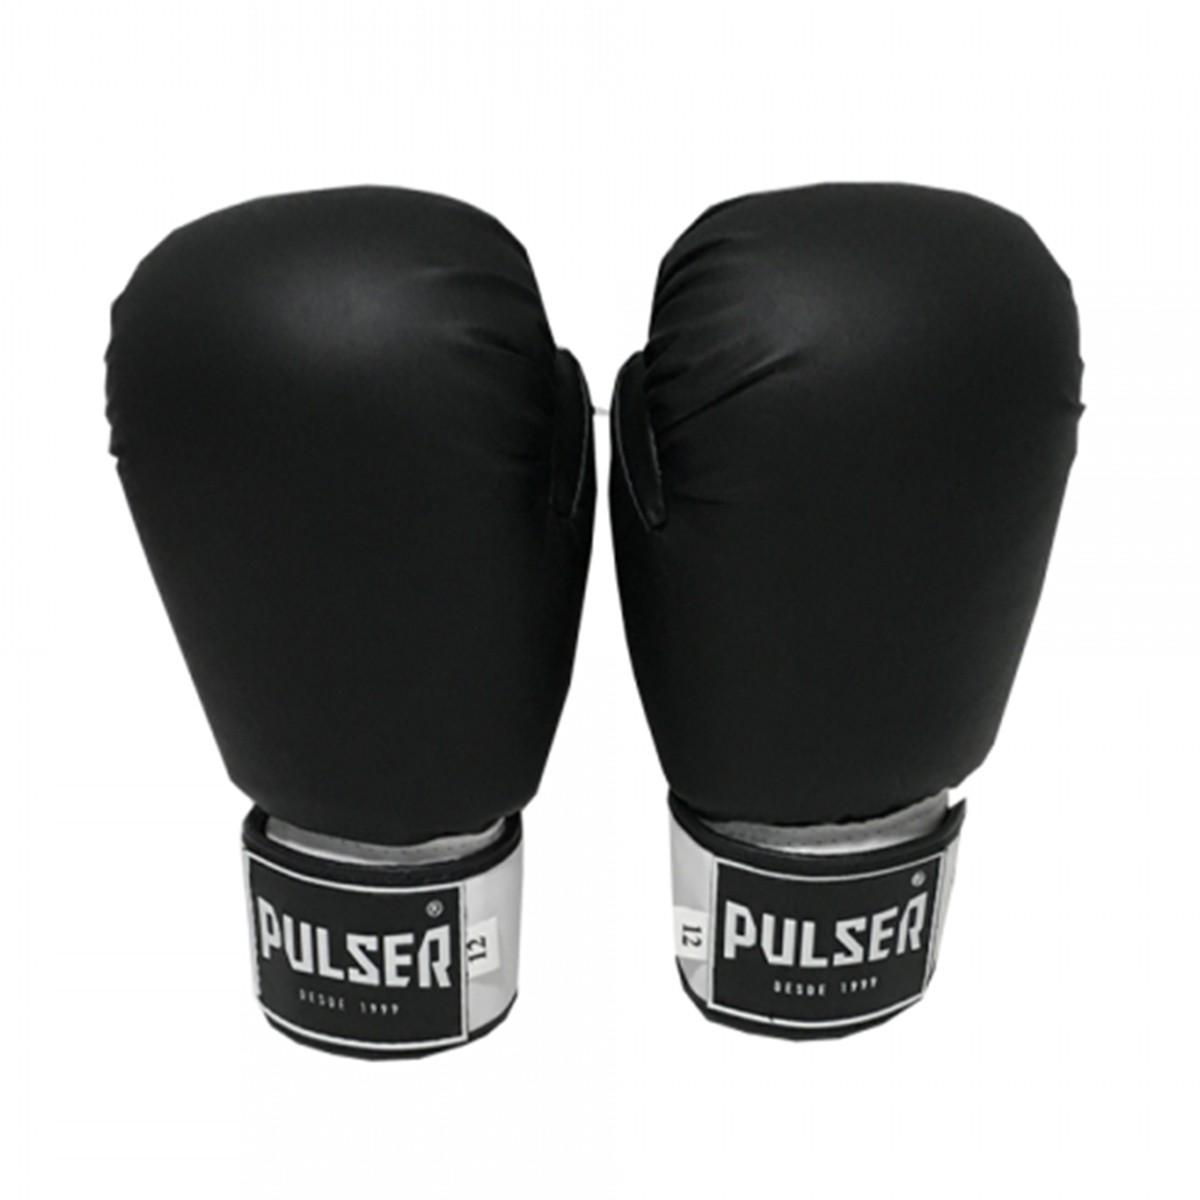 Kit de Boxe / Muay Thai 16oz - Preto  - Pulser  - PRALUTA SHOP